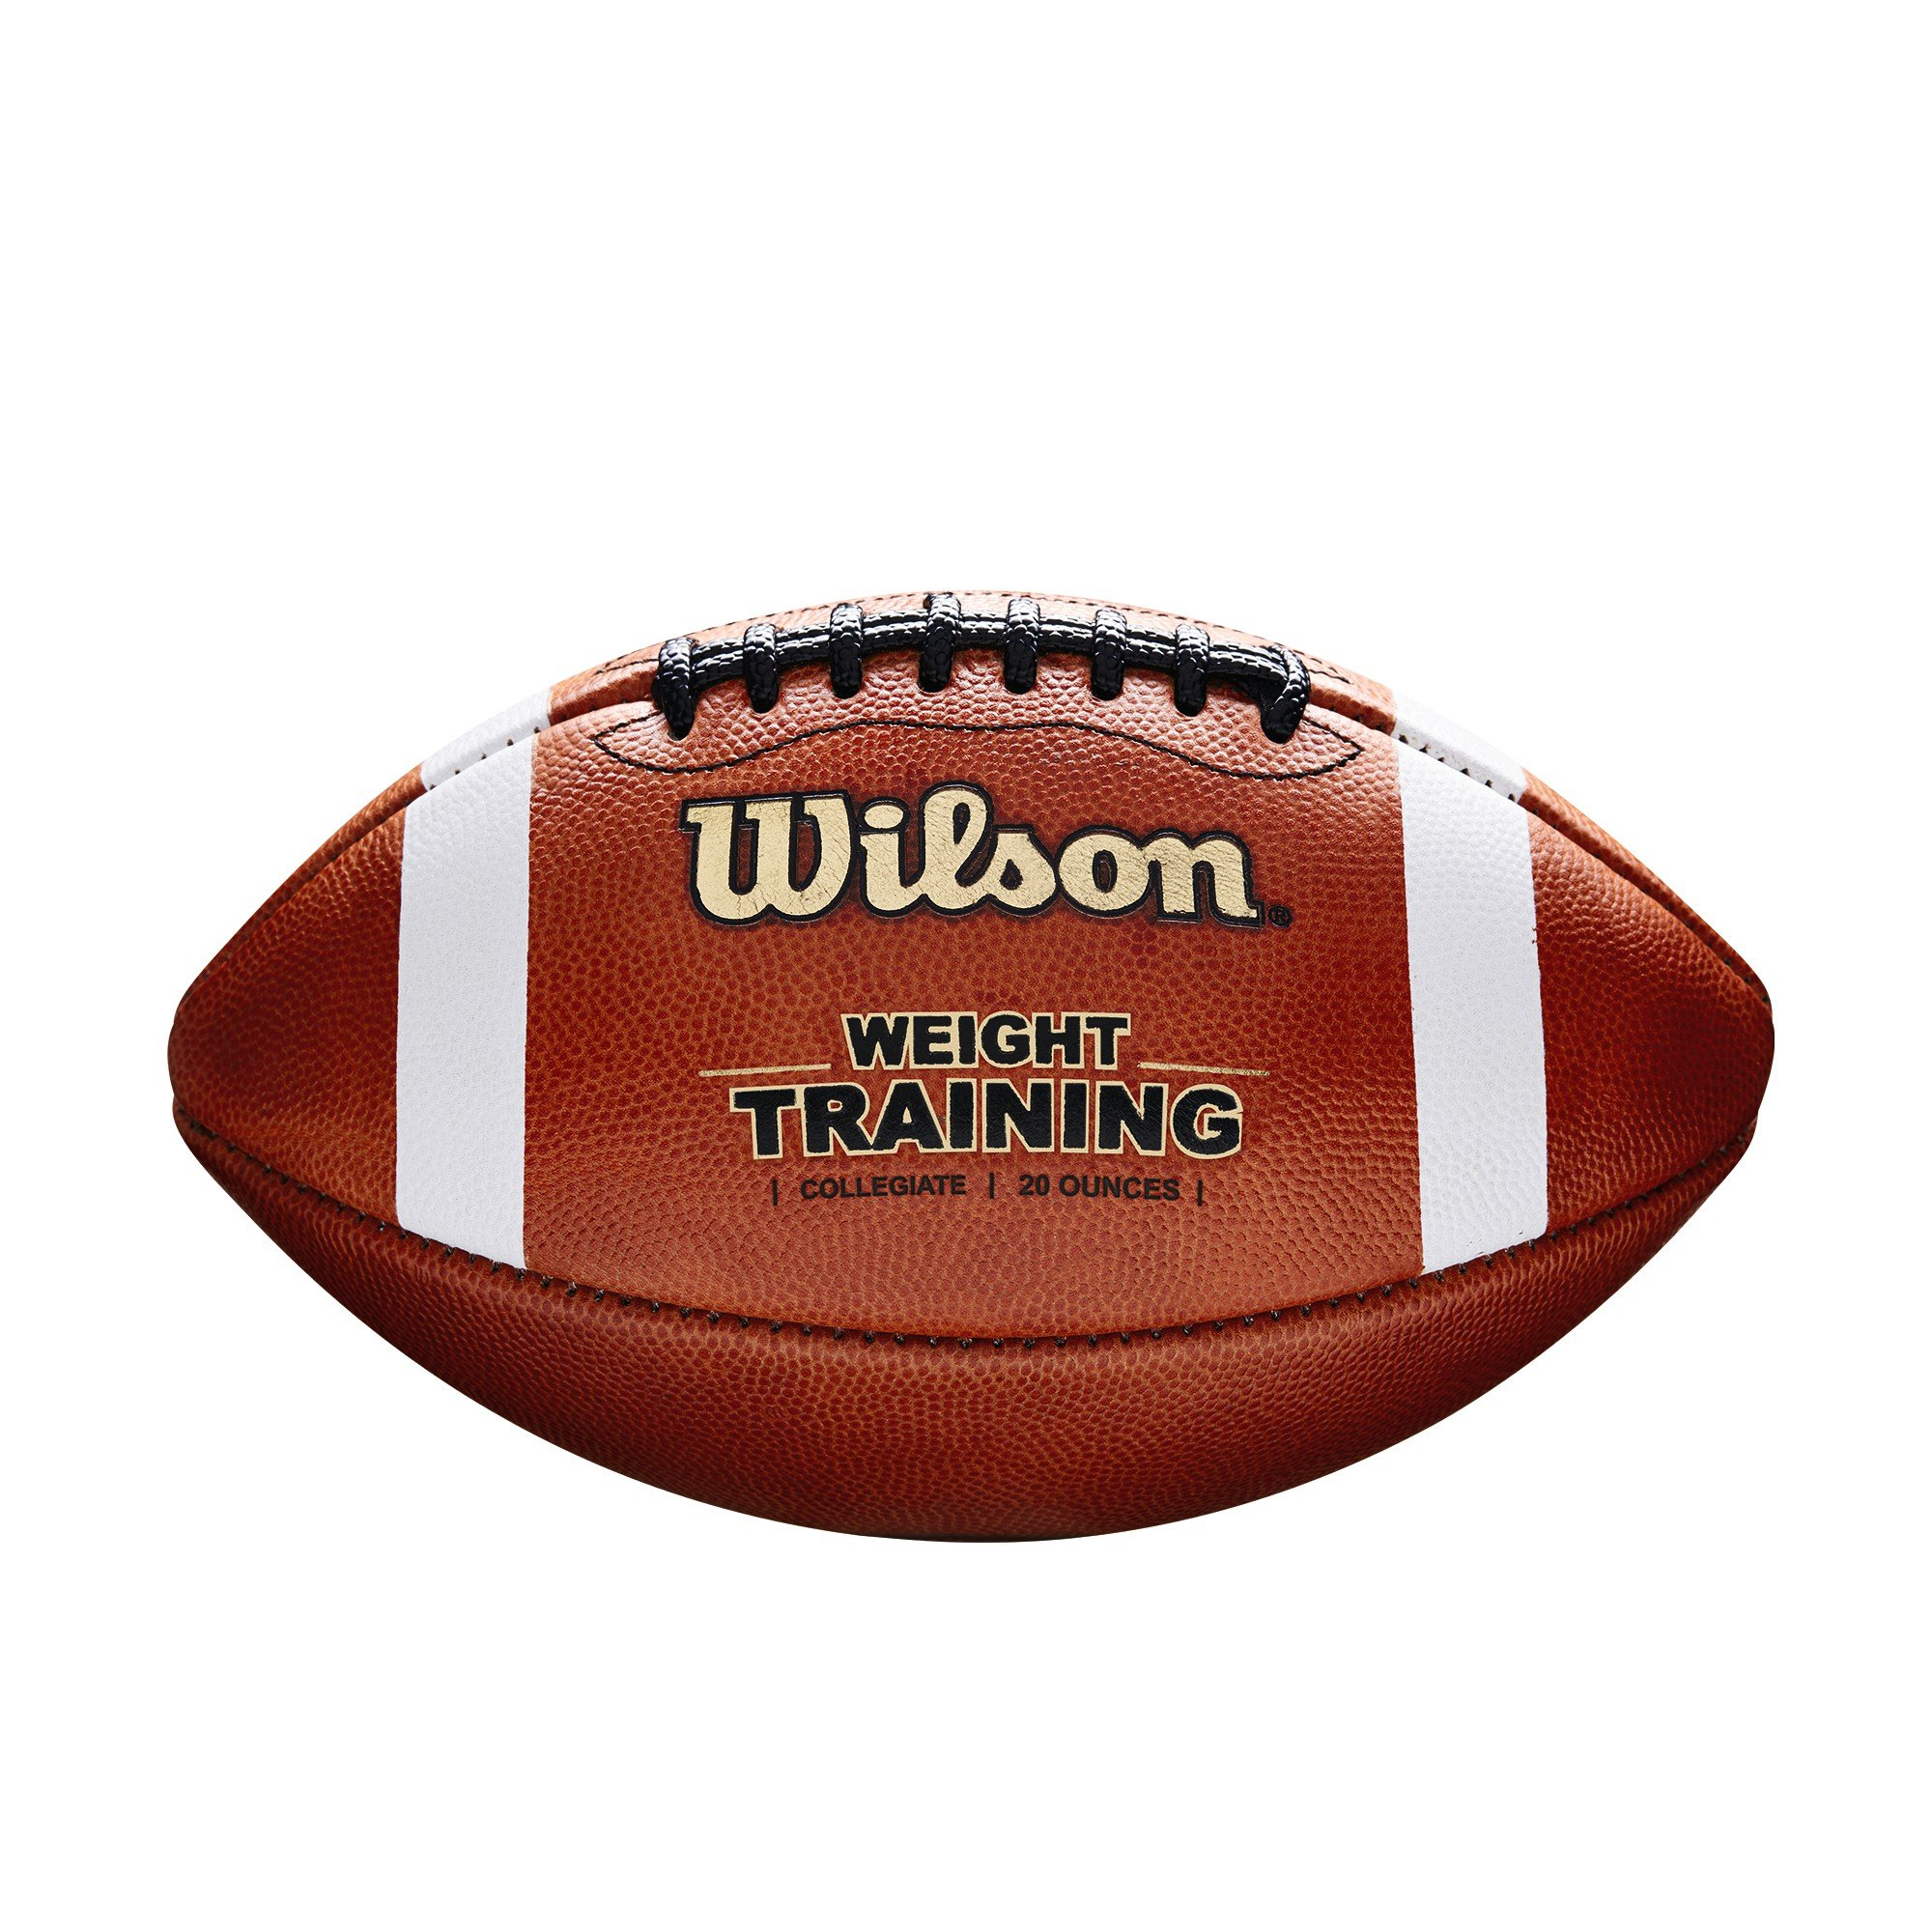 Wilson Sporting Goods 20 oz Weight Training Football